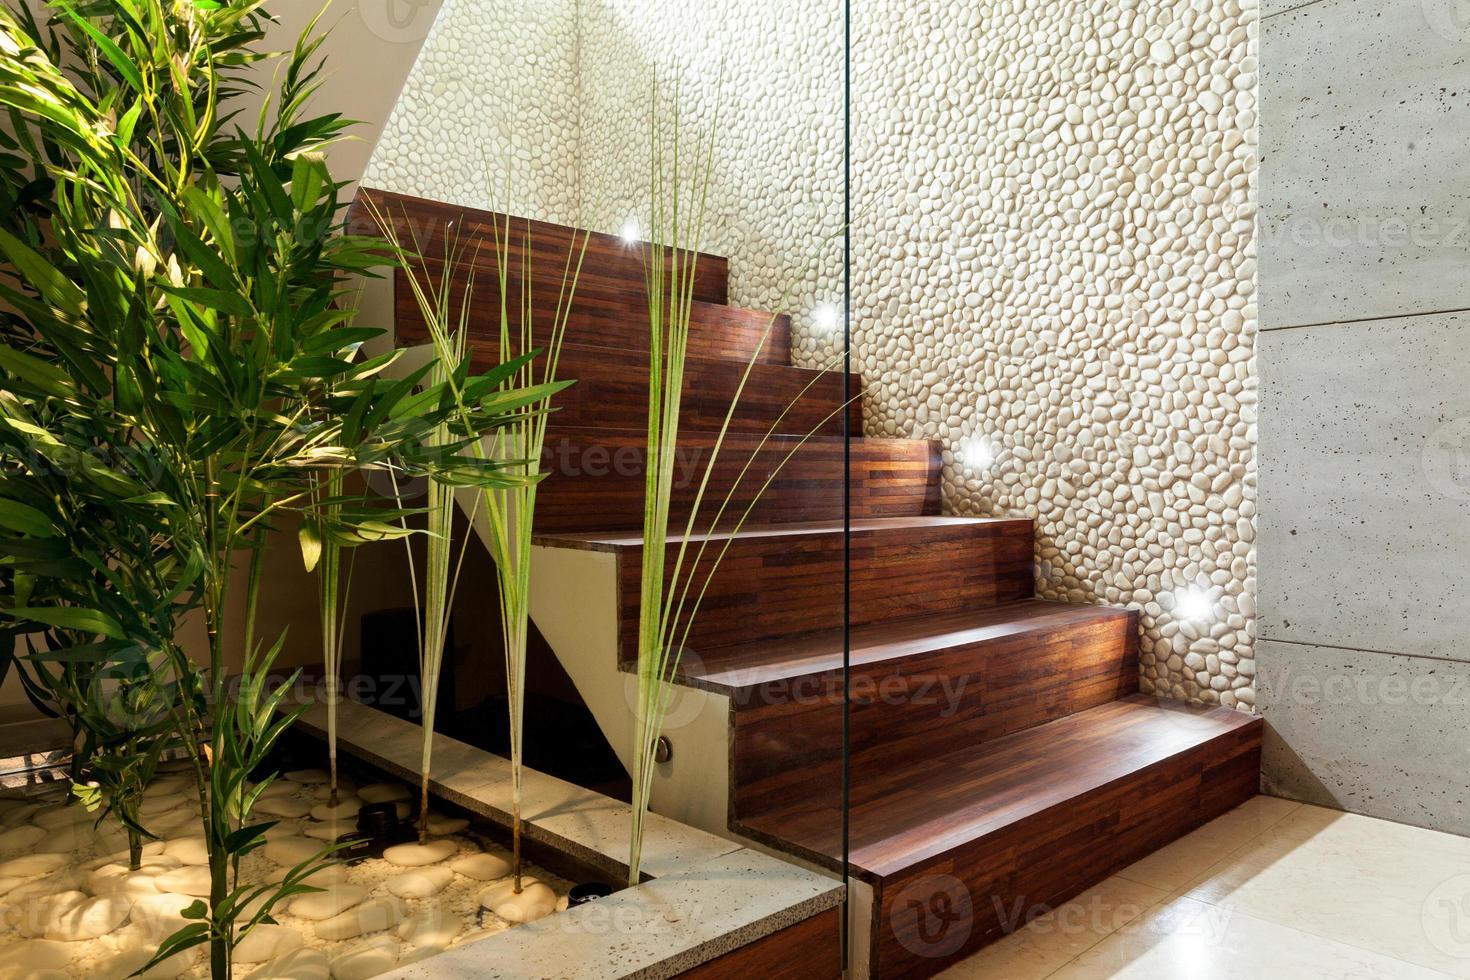 escada de madeira iluminada foto